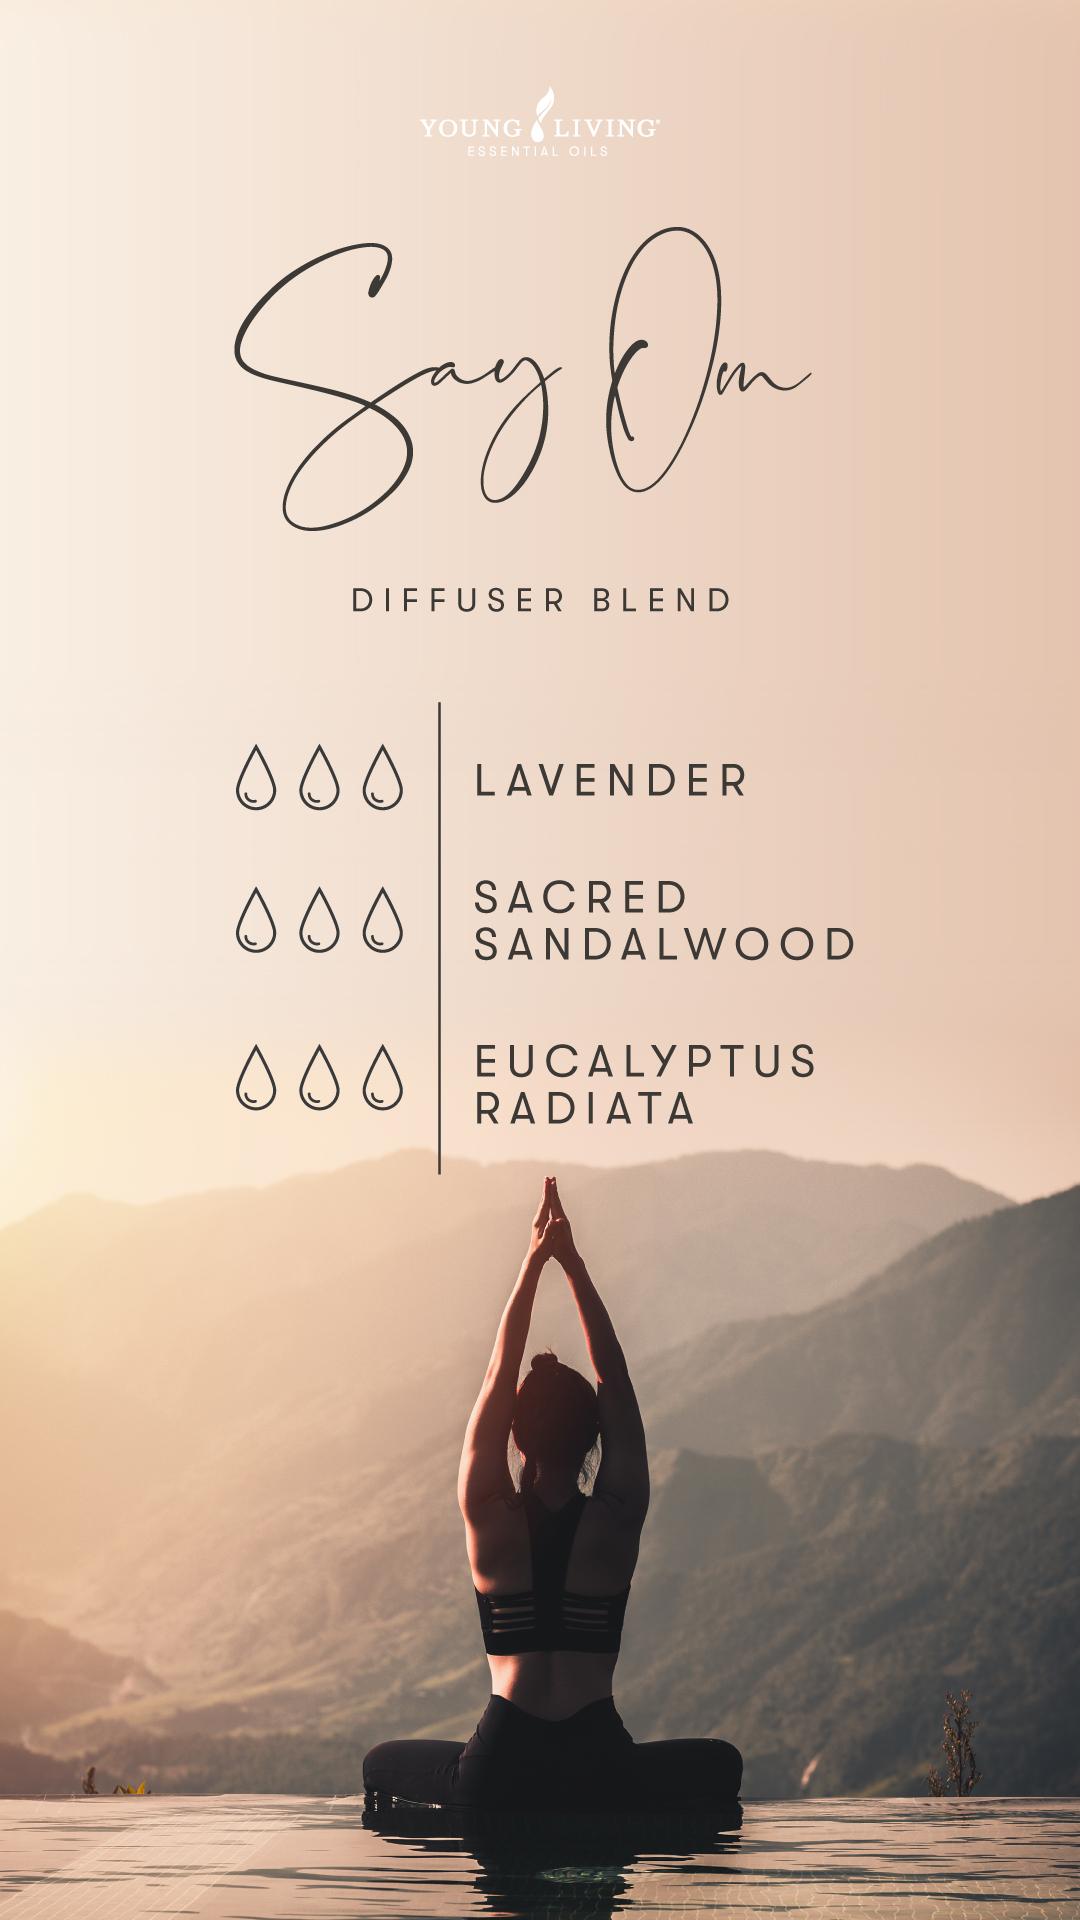 Say Om Diffuser Blend - 3 drops Lavender, 3 drops Sacred Sandalwood, 3 drops Eucalyptus Radiata